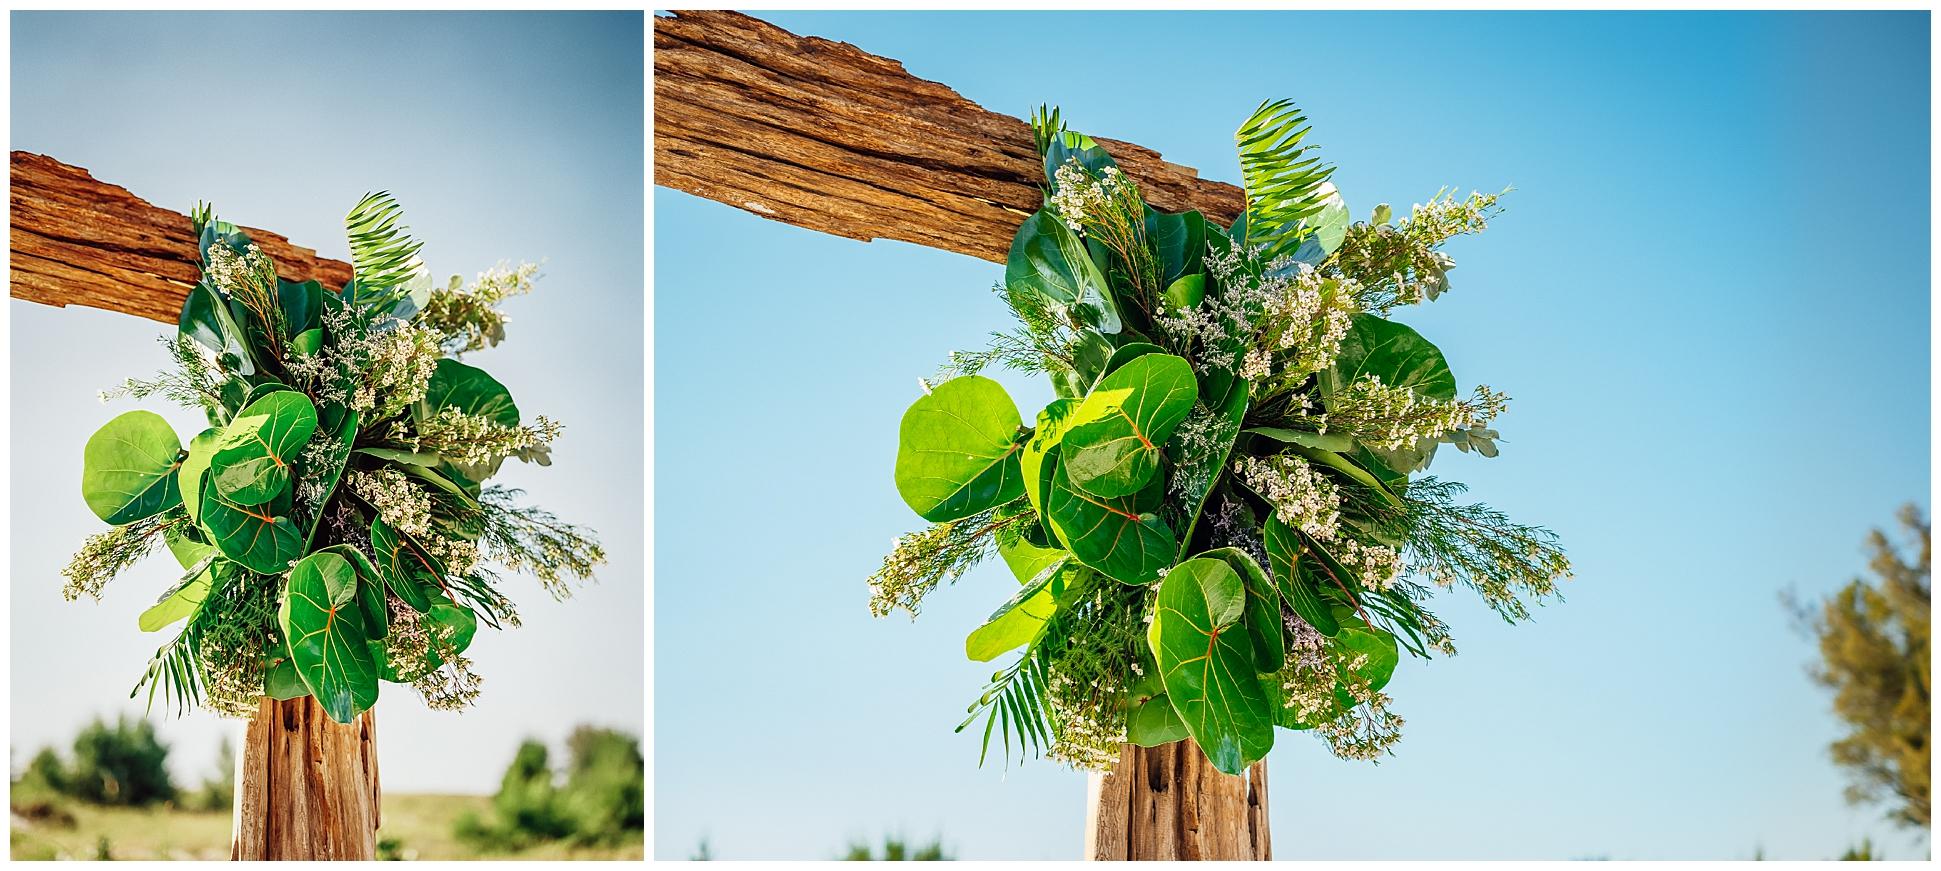 medium-format-film-vs-digital-wedding-photography-florida-beach_0008.jpg